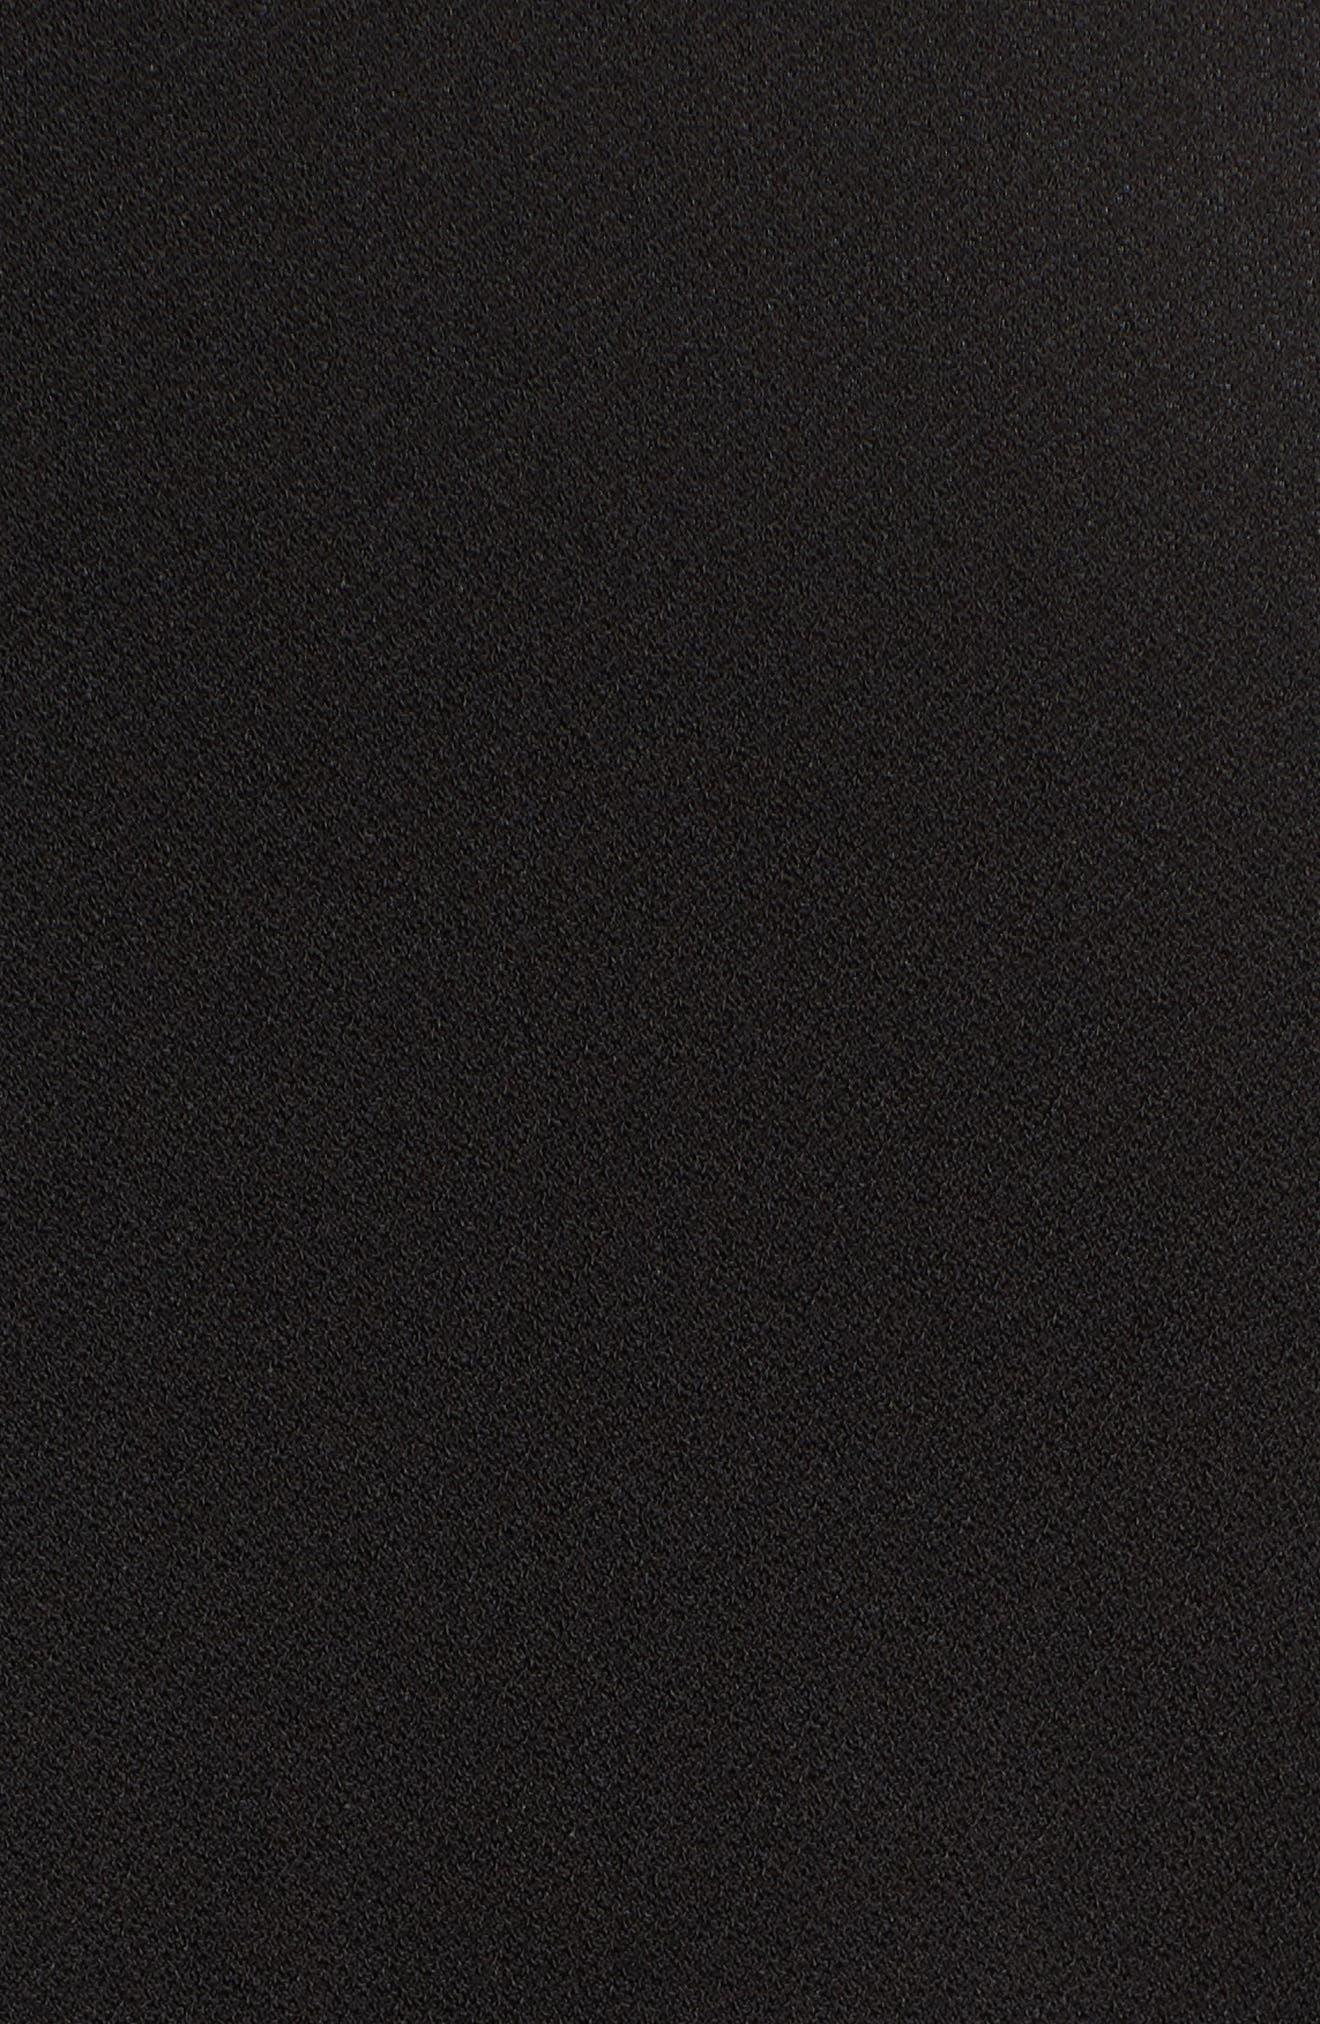 Rivet Split Sleeve Top,                             Alternate thumbnail 6, color,                             060-Rich Black